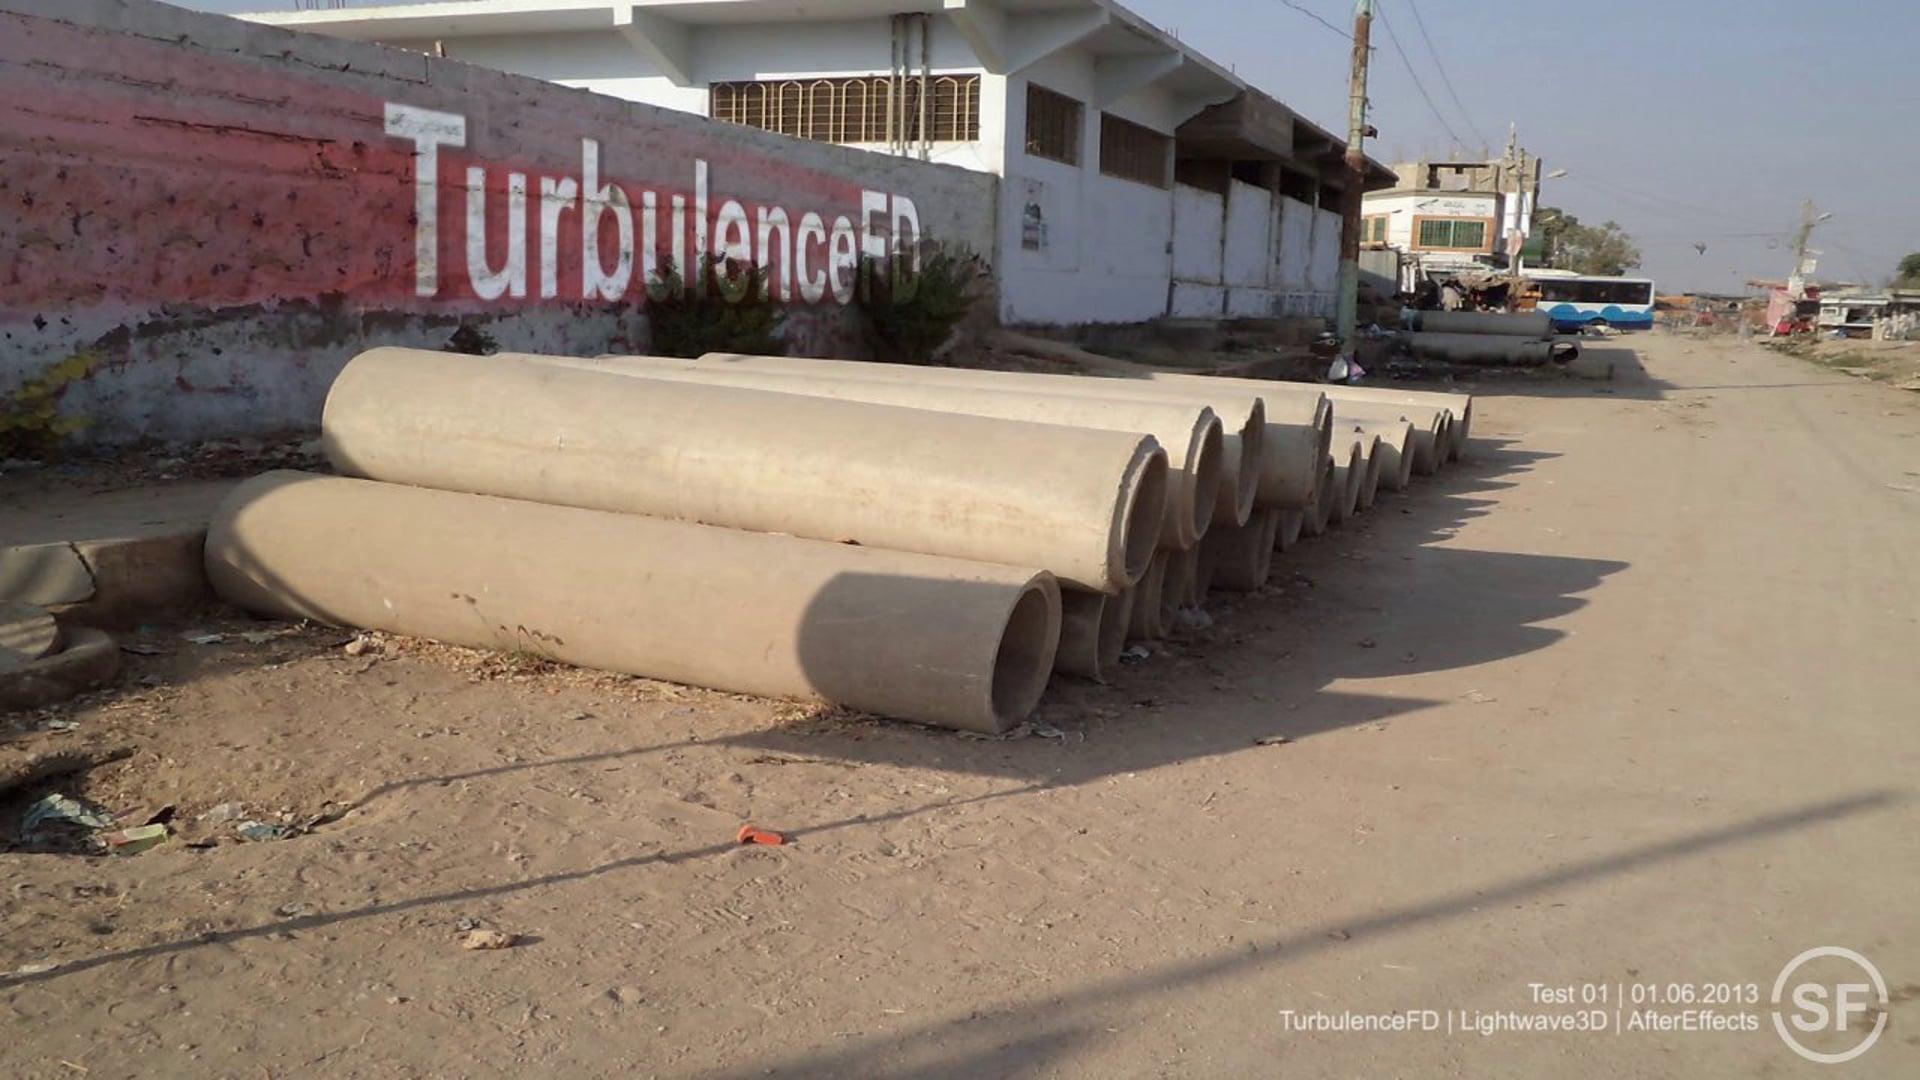 Turbulence FD